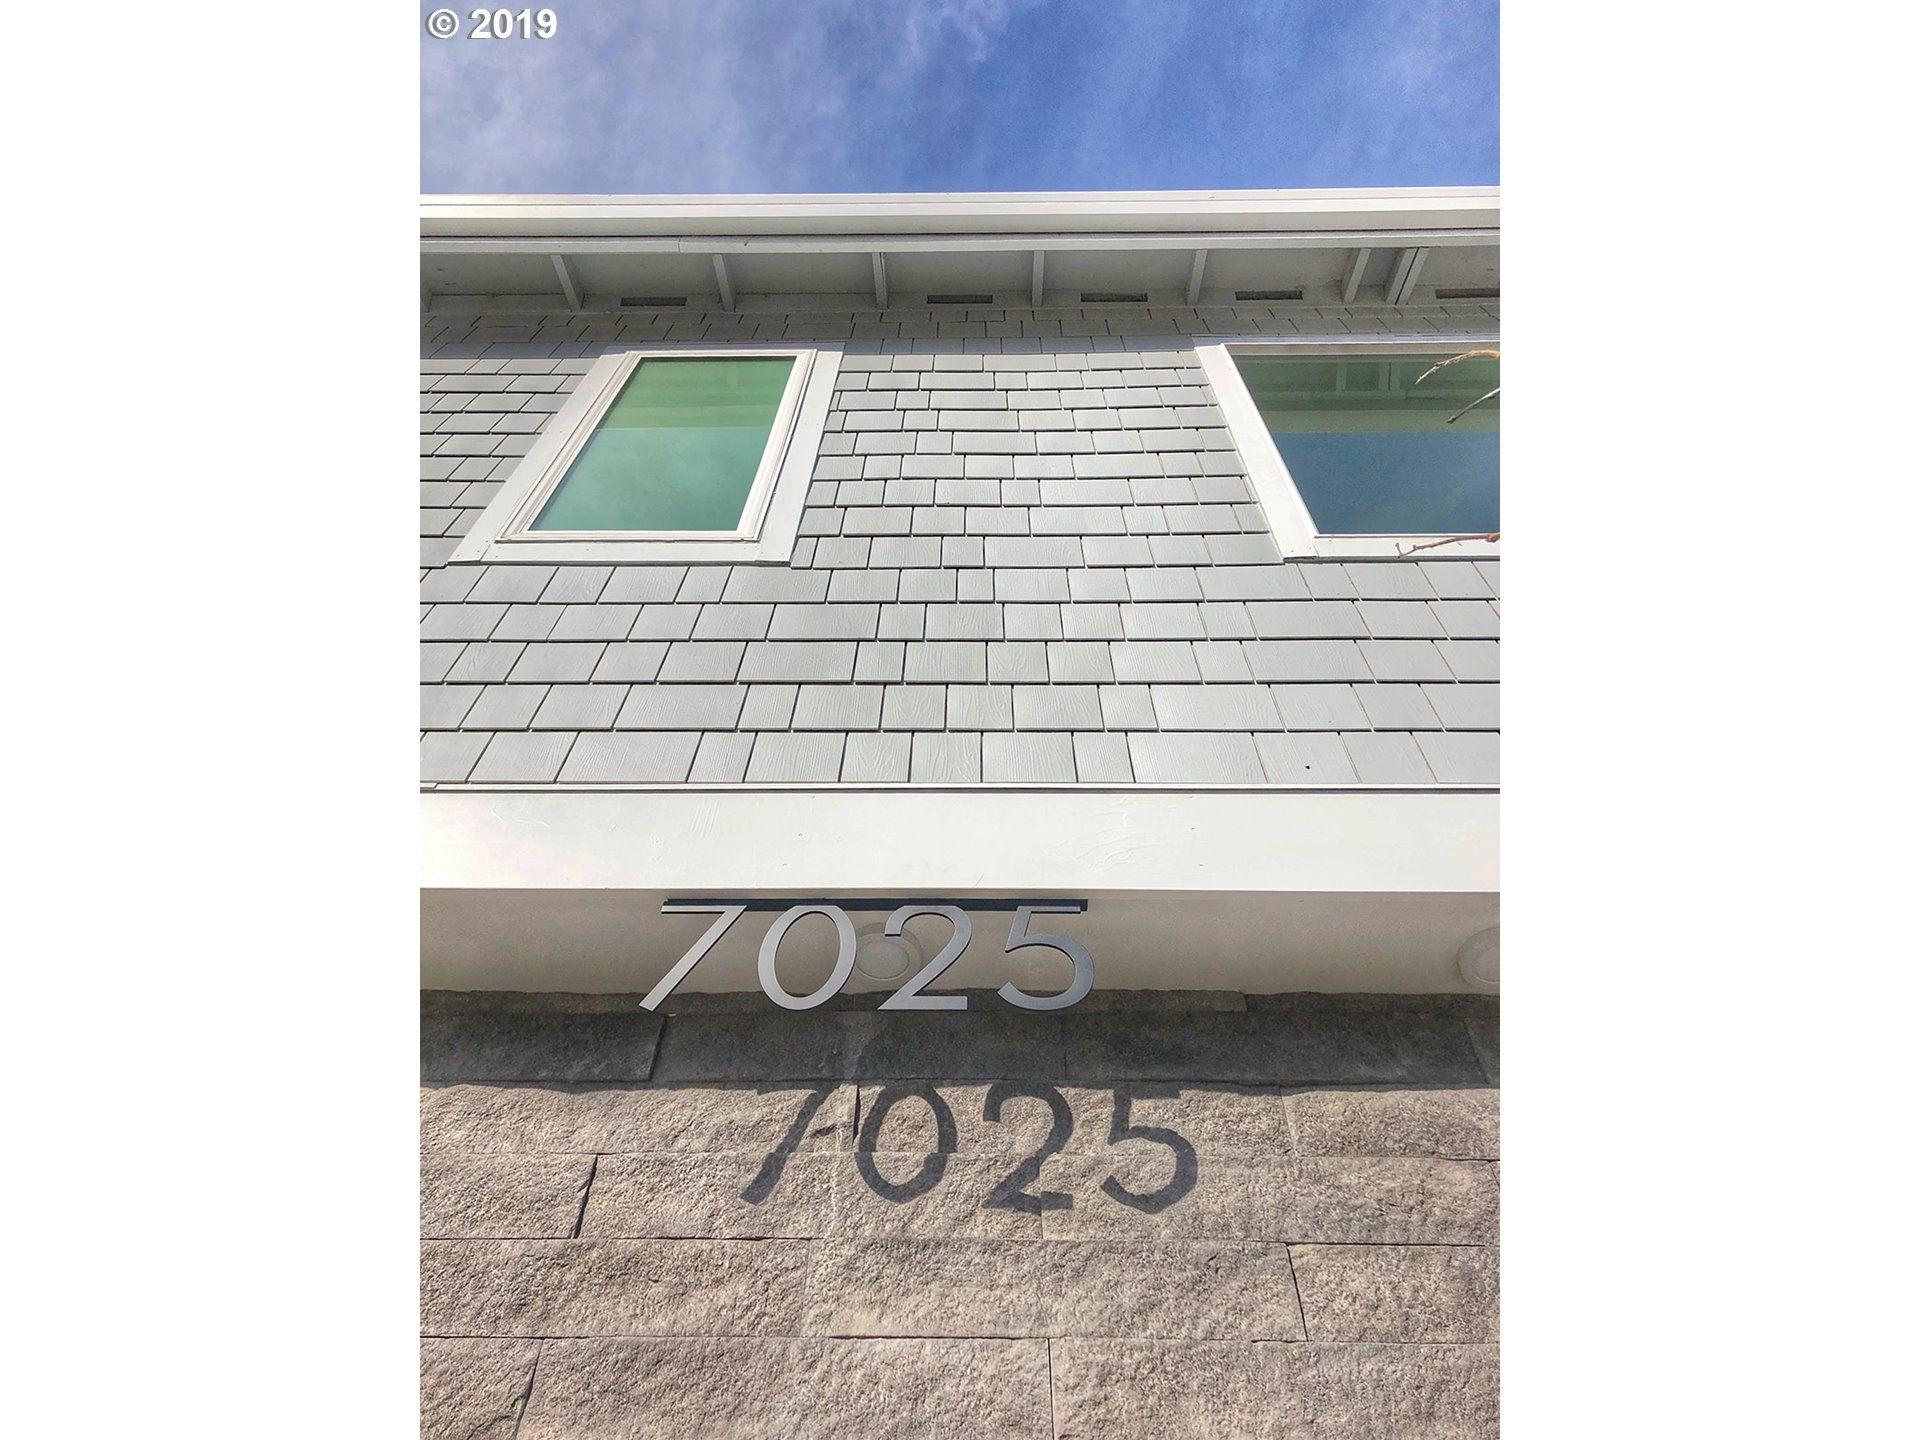 19249392 2